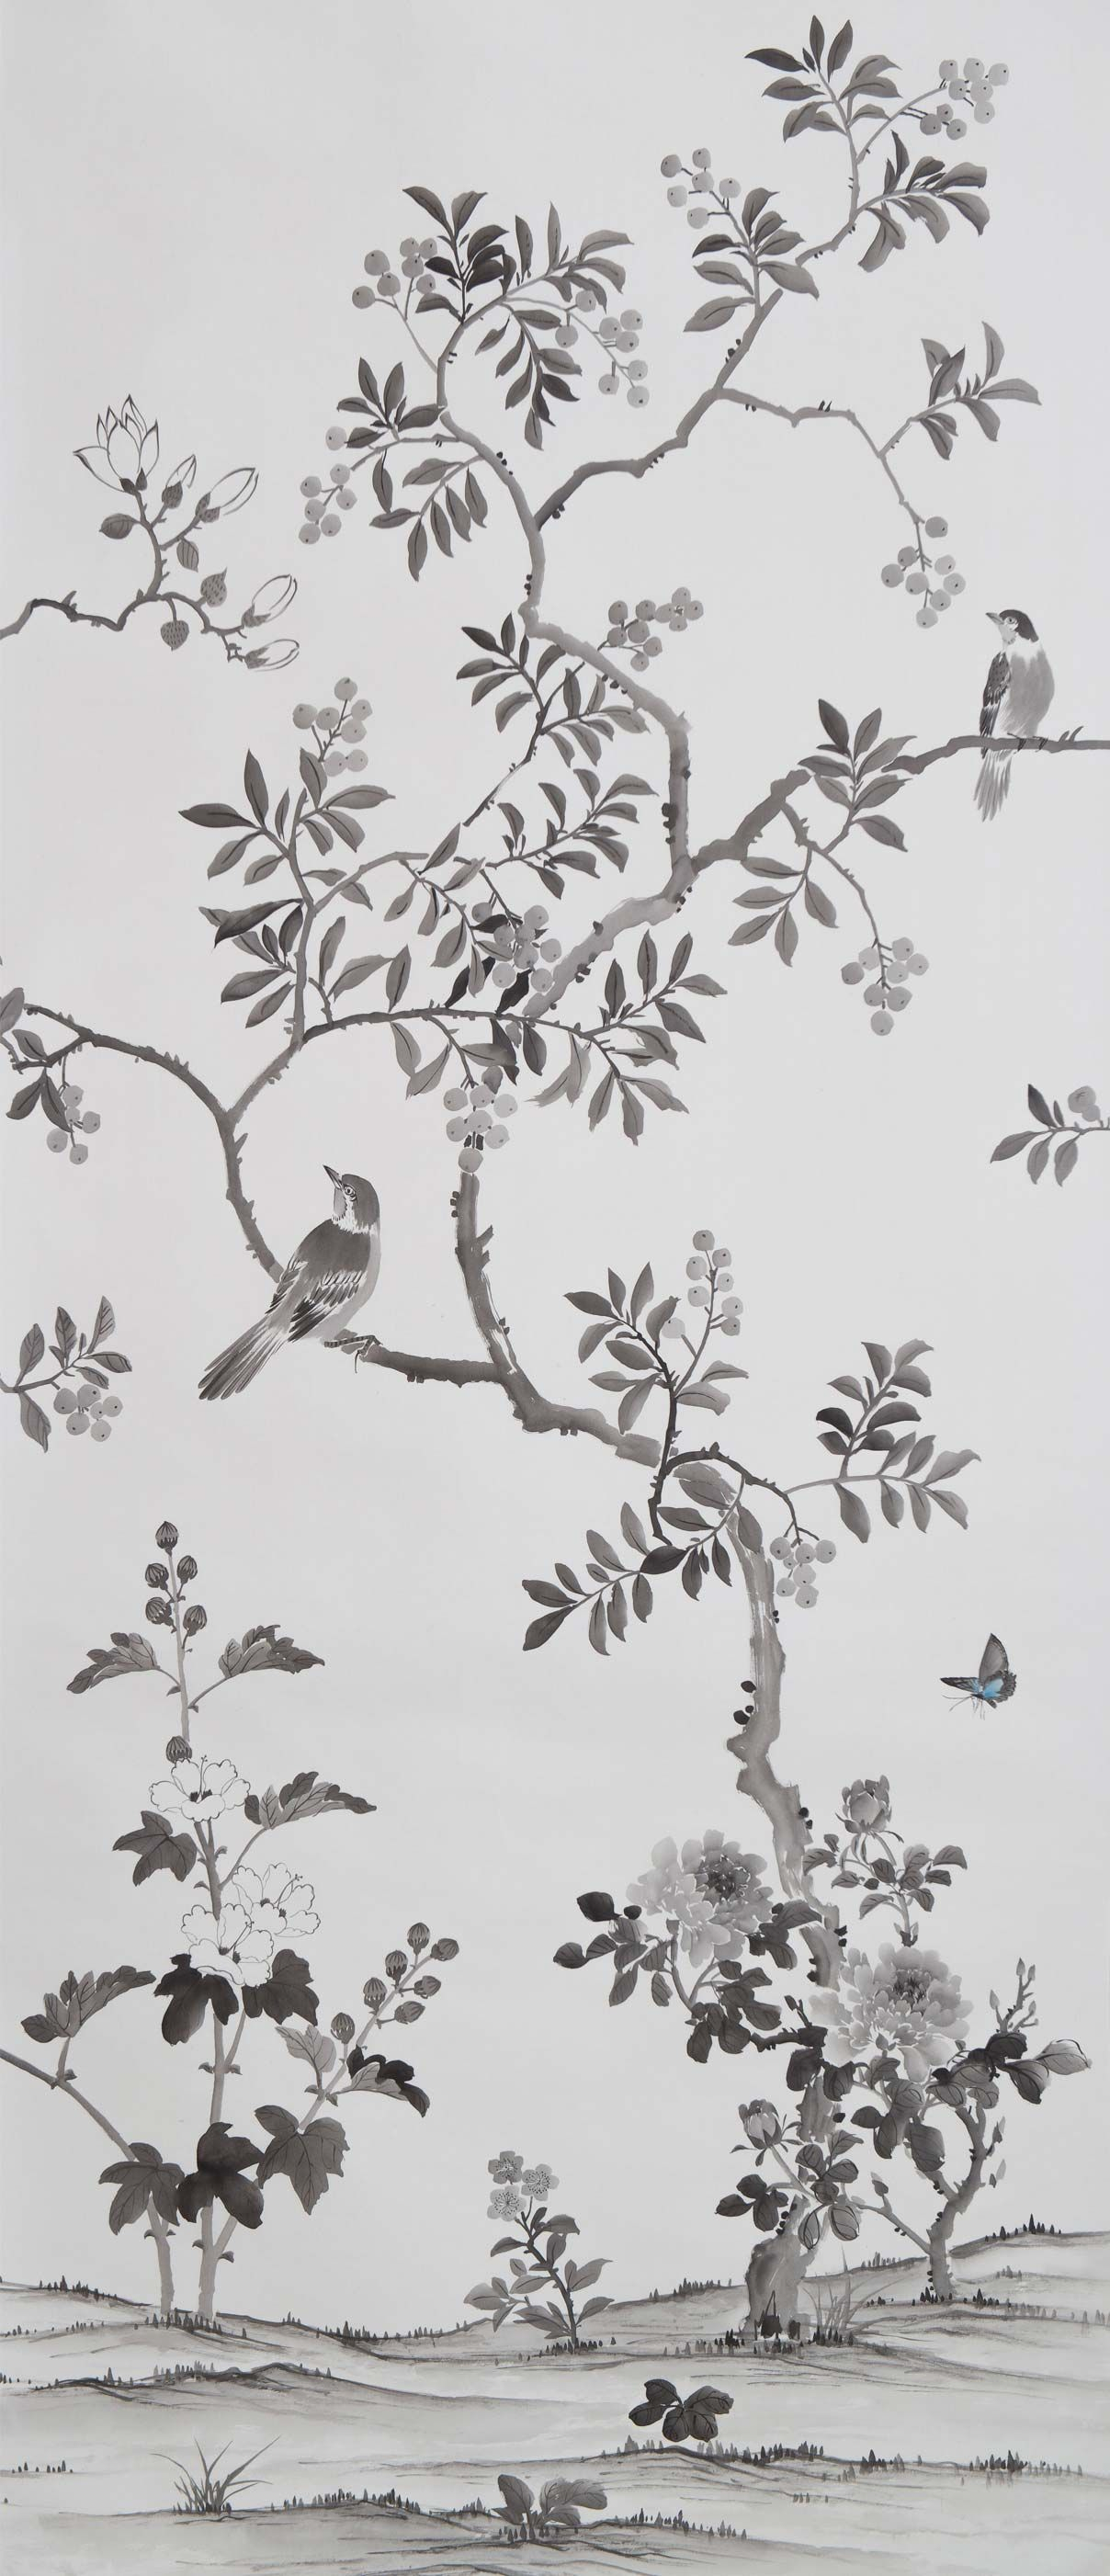 Marvelous Inspiration For Wondrous Nature .